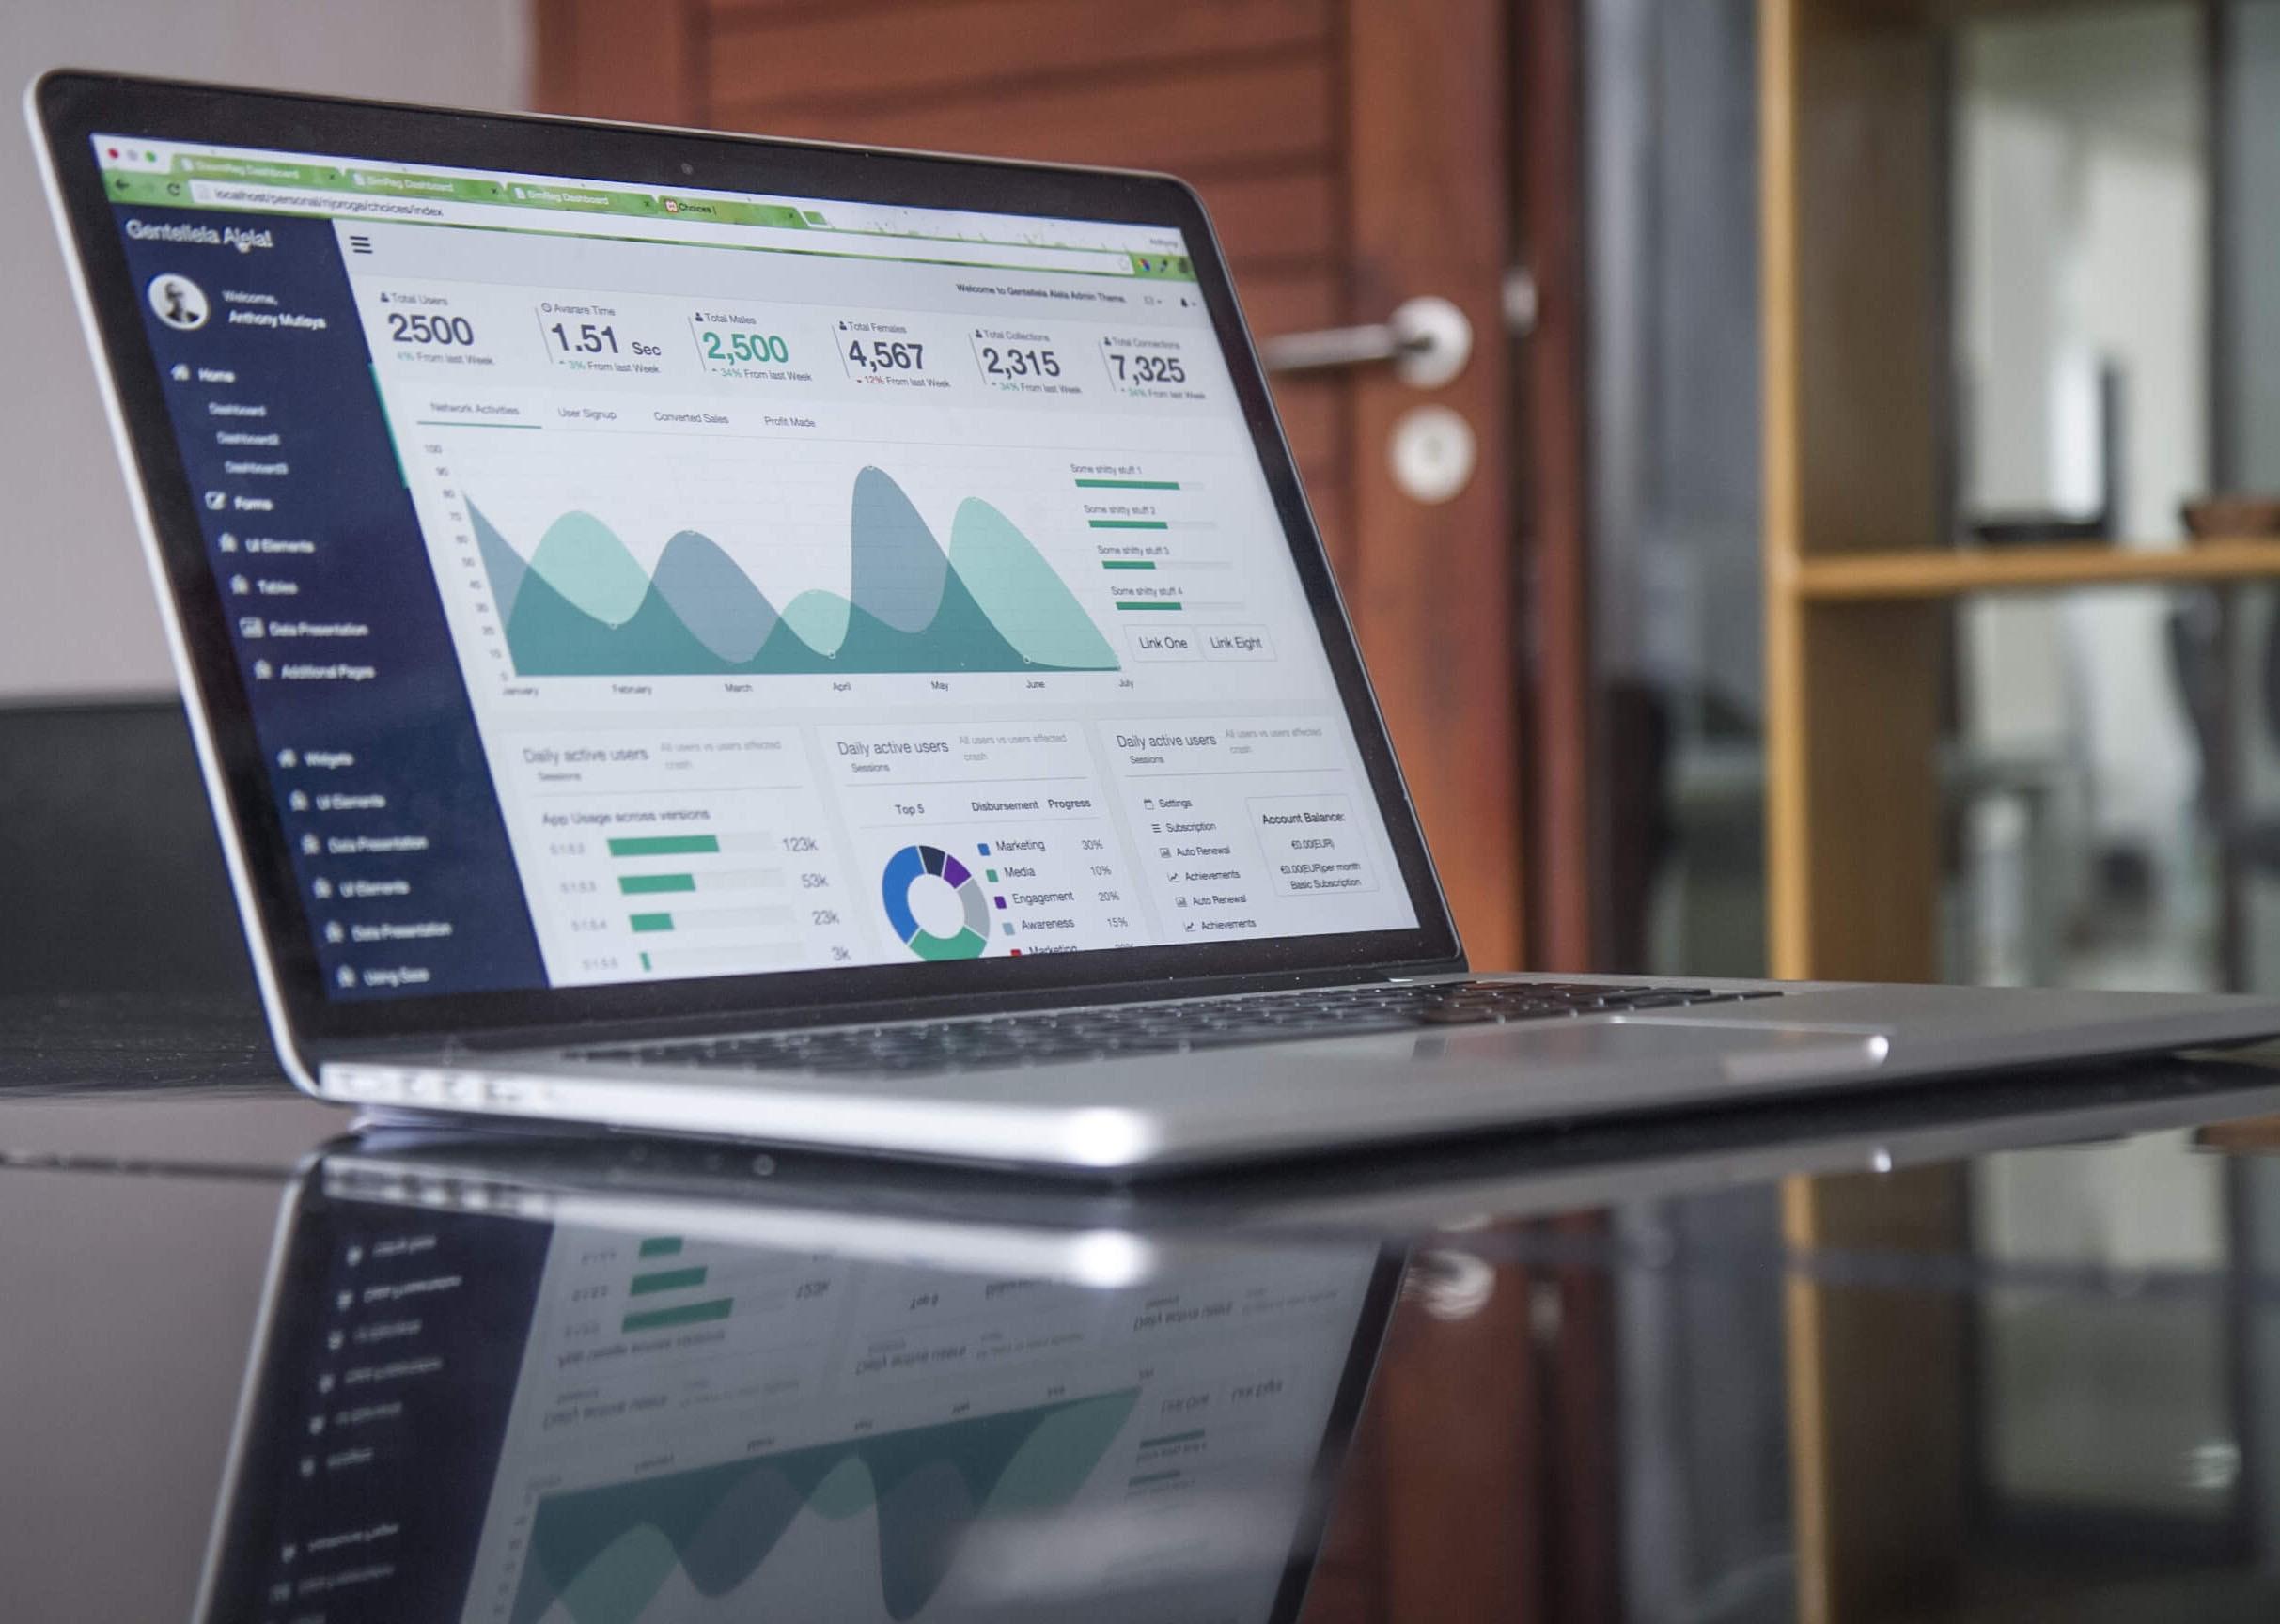 Analytics of Website Tracking